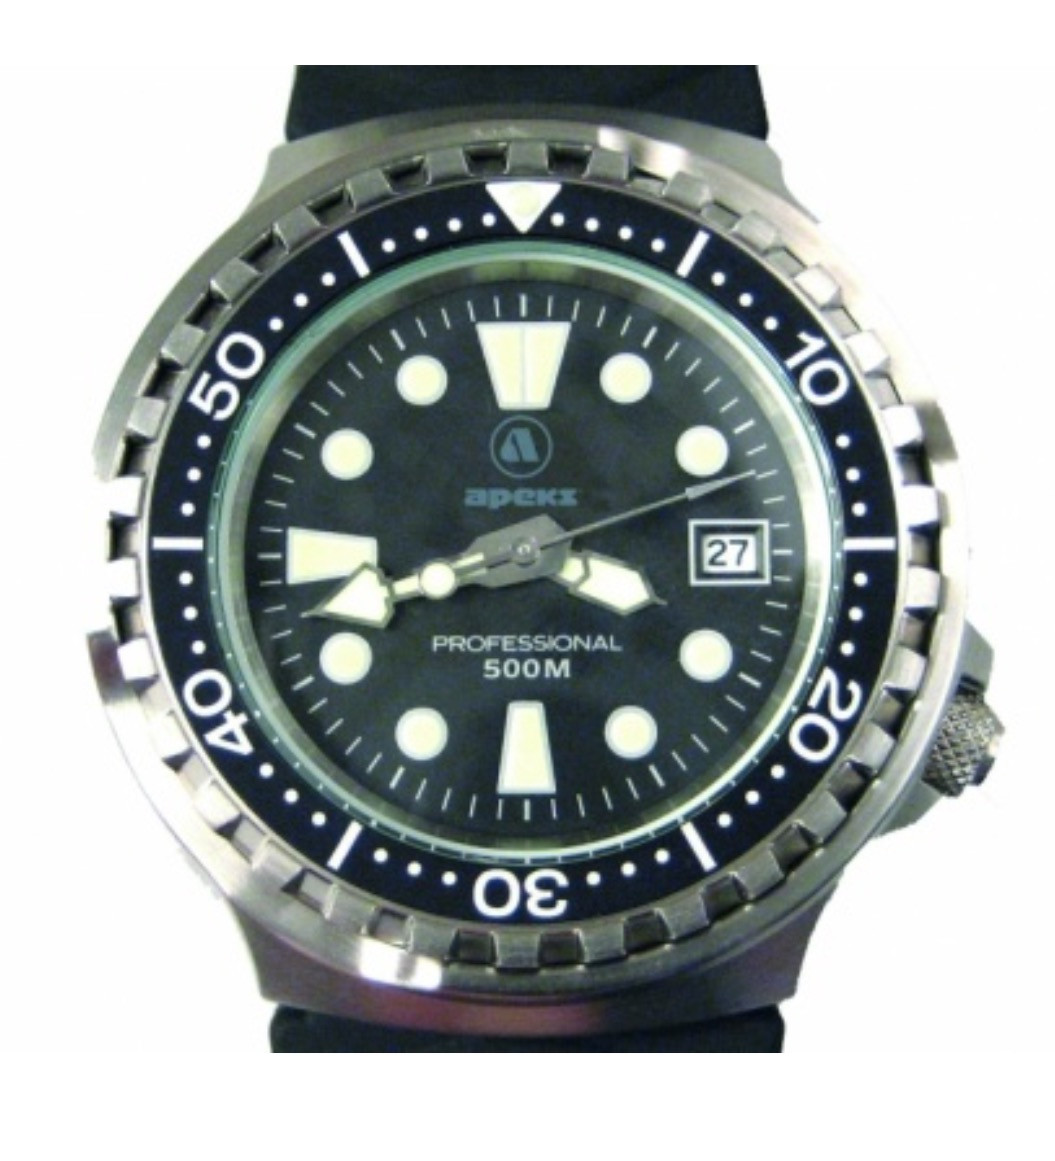 Apeks 500m Scuba Diving Watch in Presentation Case